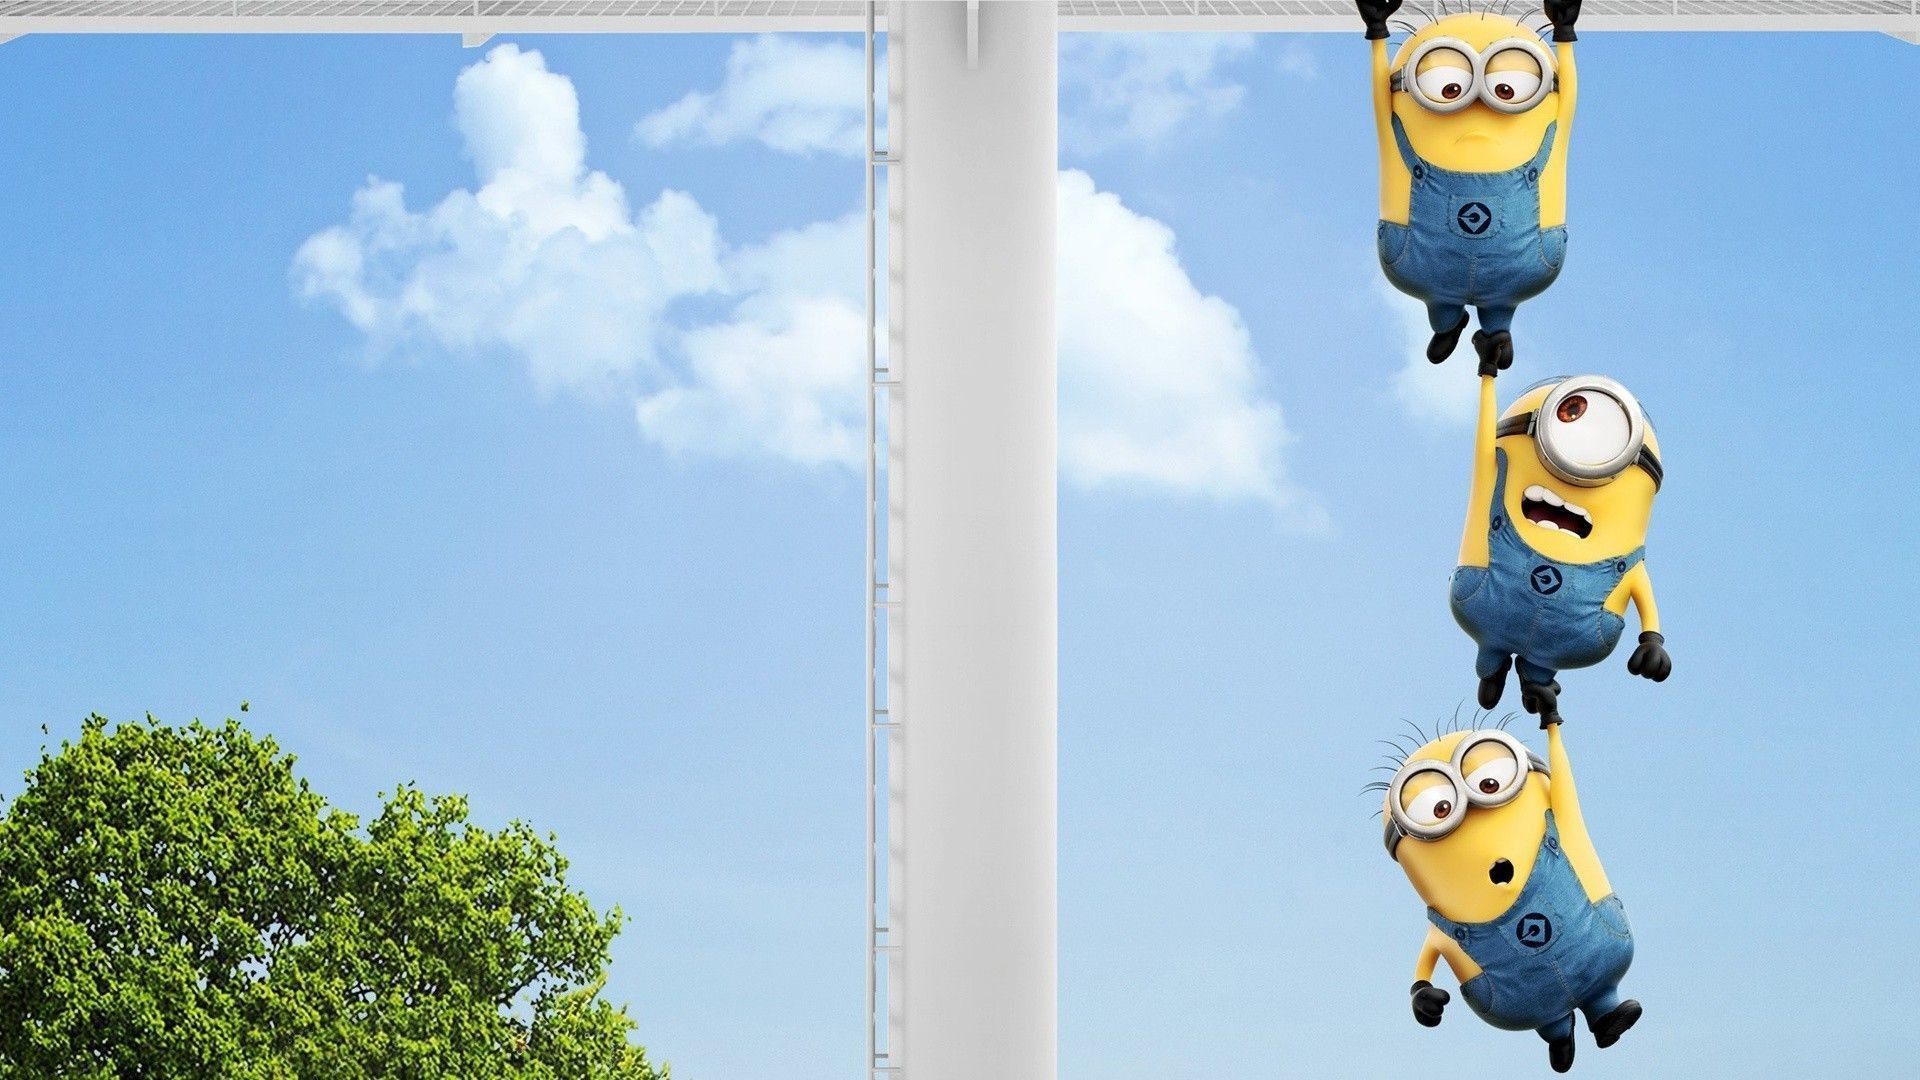 best ideas about Minion wallpaper on Pinterest Cute minions